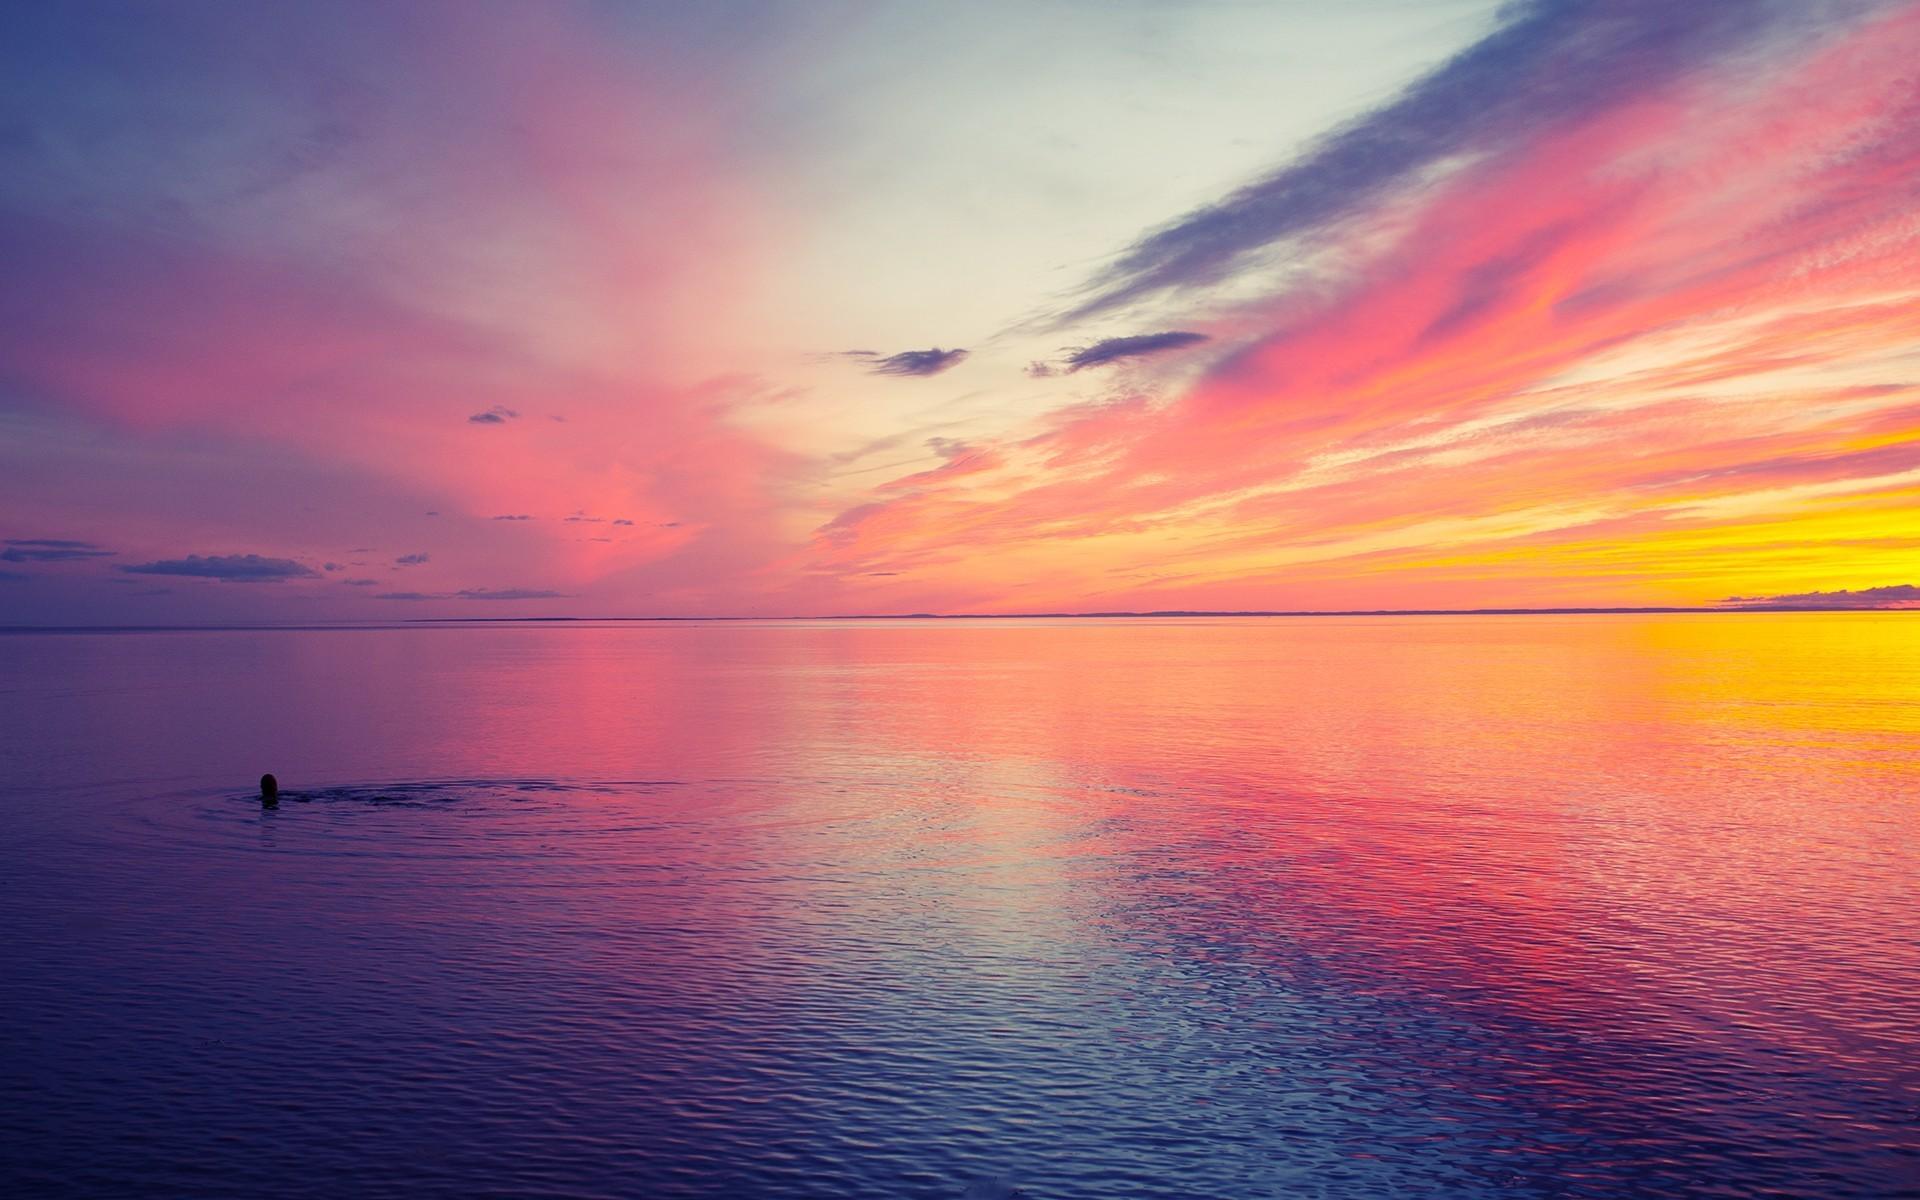 1920x1200, Nature Wallpapers - Beautiful Sunset - HD Wallpaper